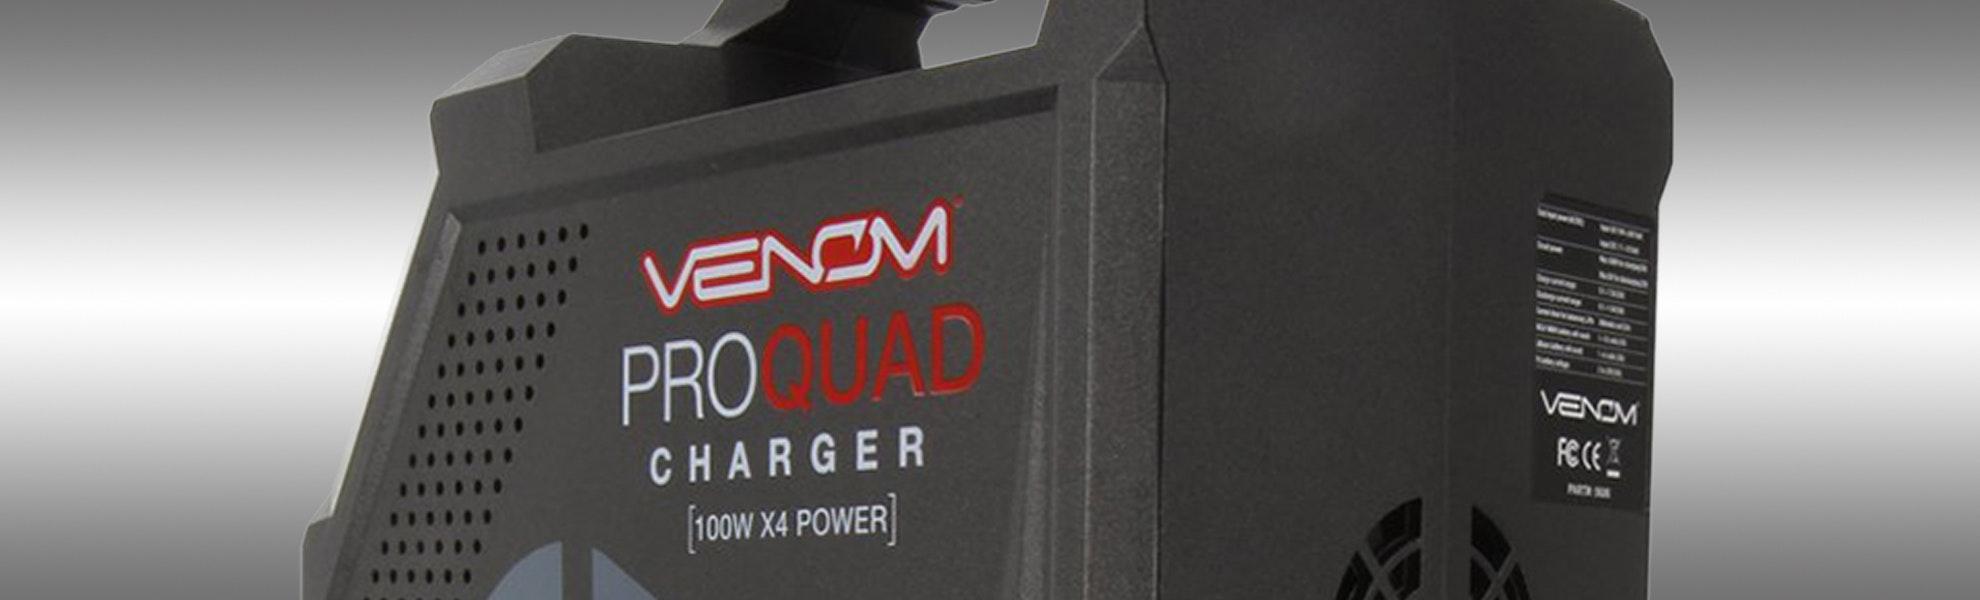 Venom Pro Quad 100W 4-Port AC/DC Charger Pre-Order